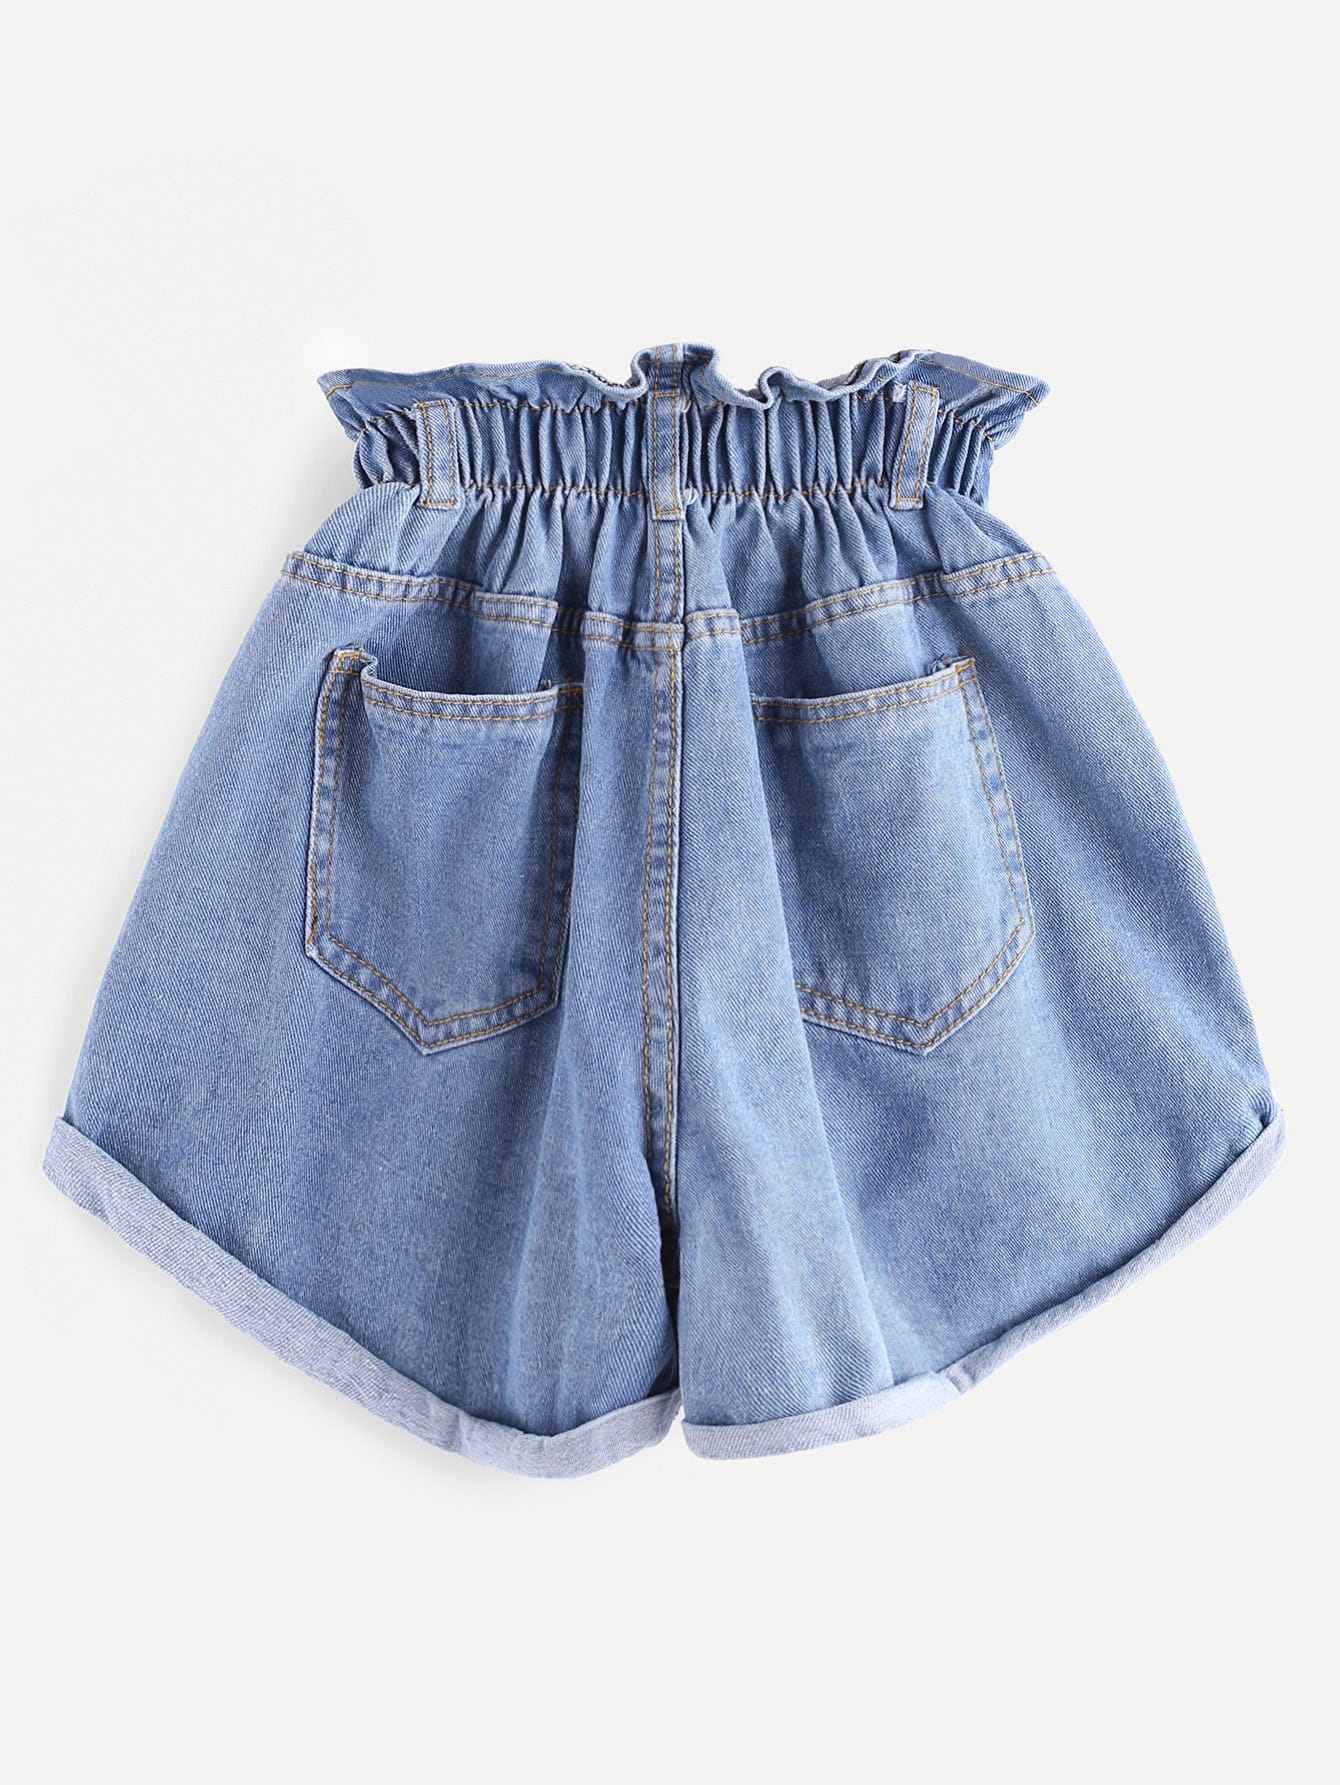 shorts170504302_2